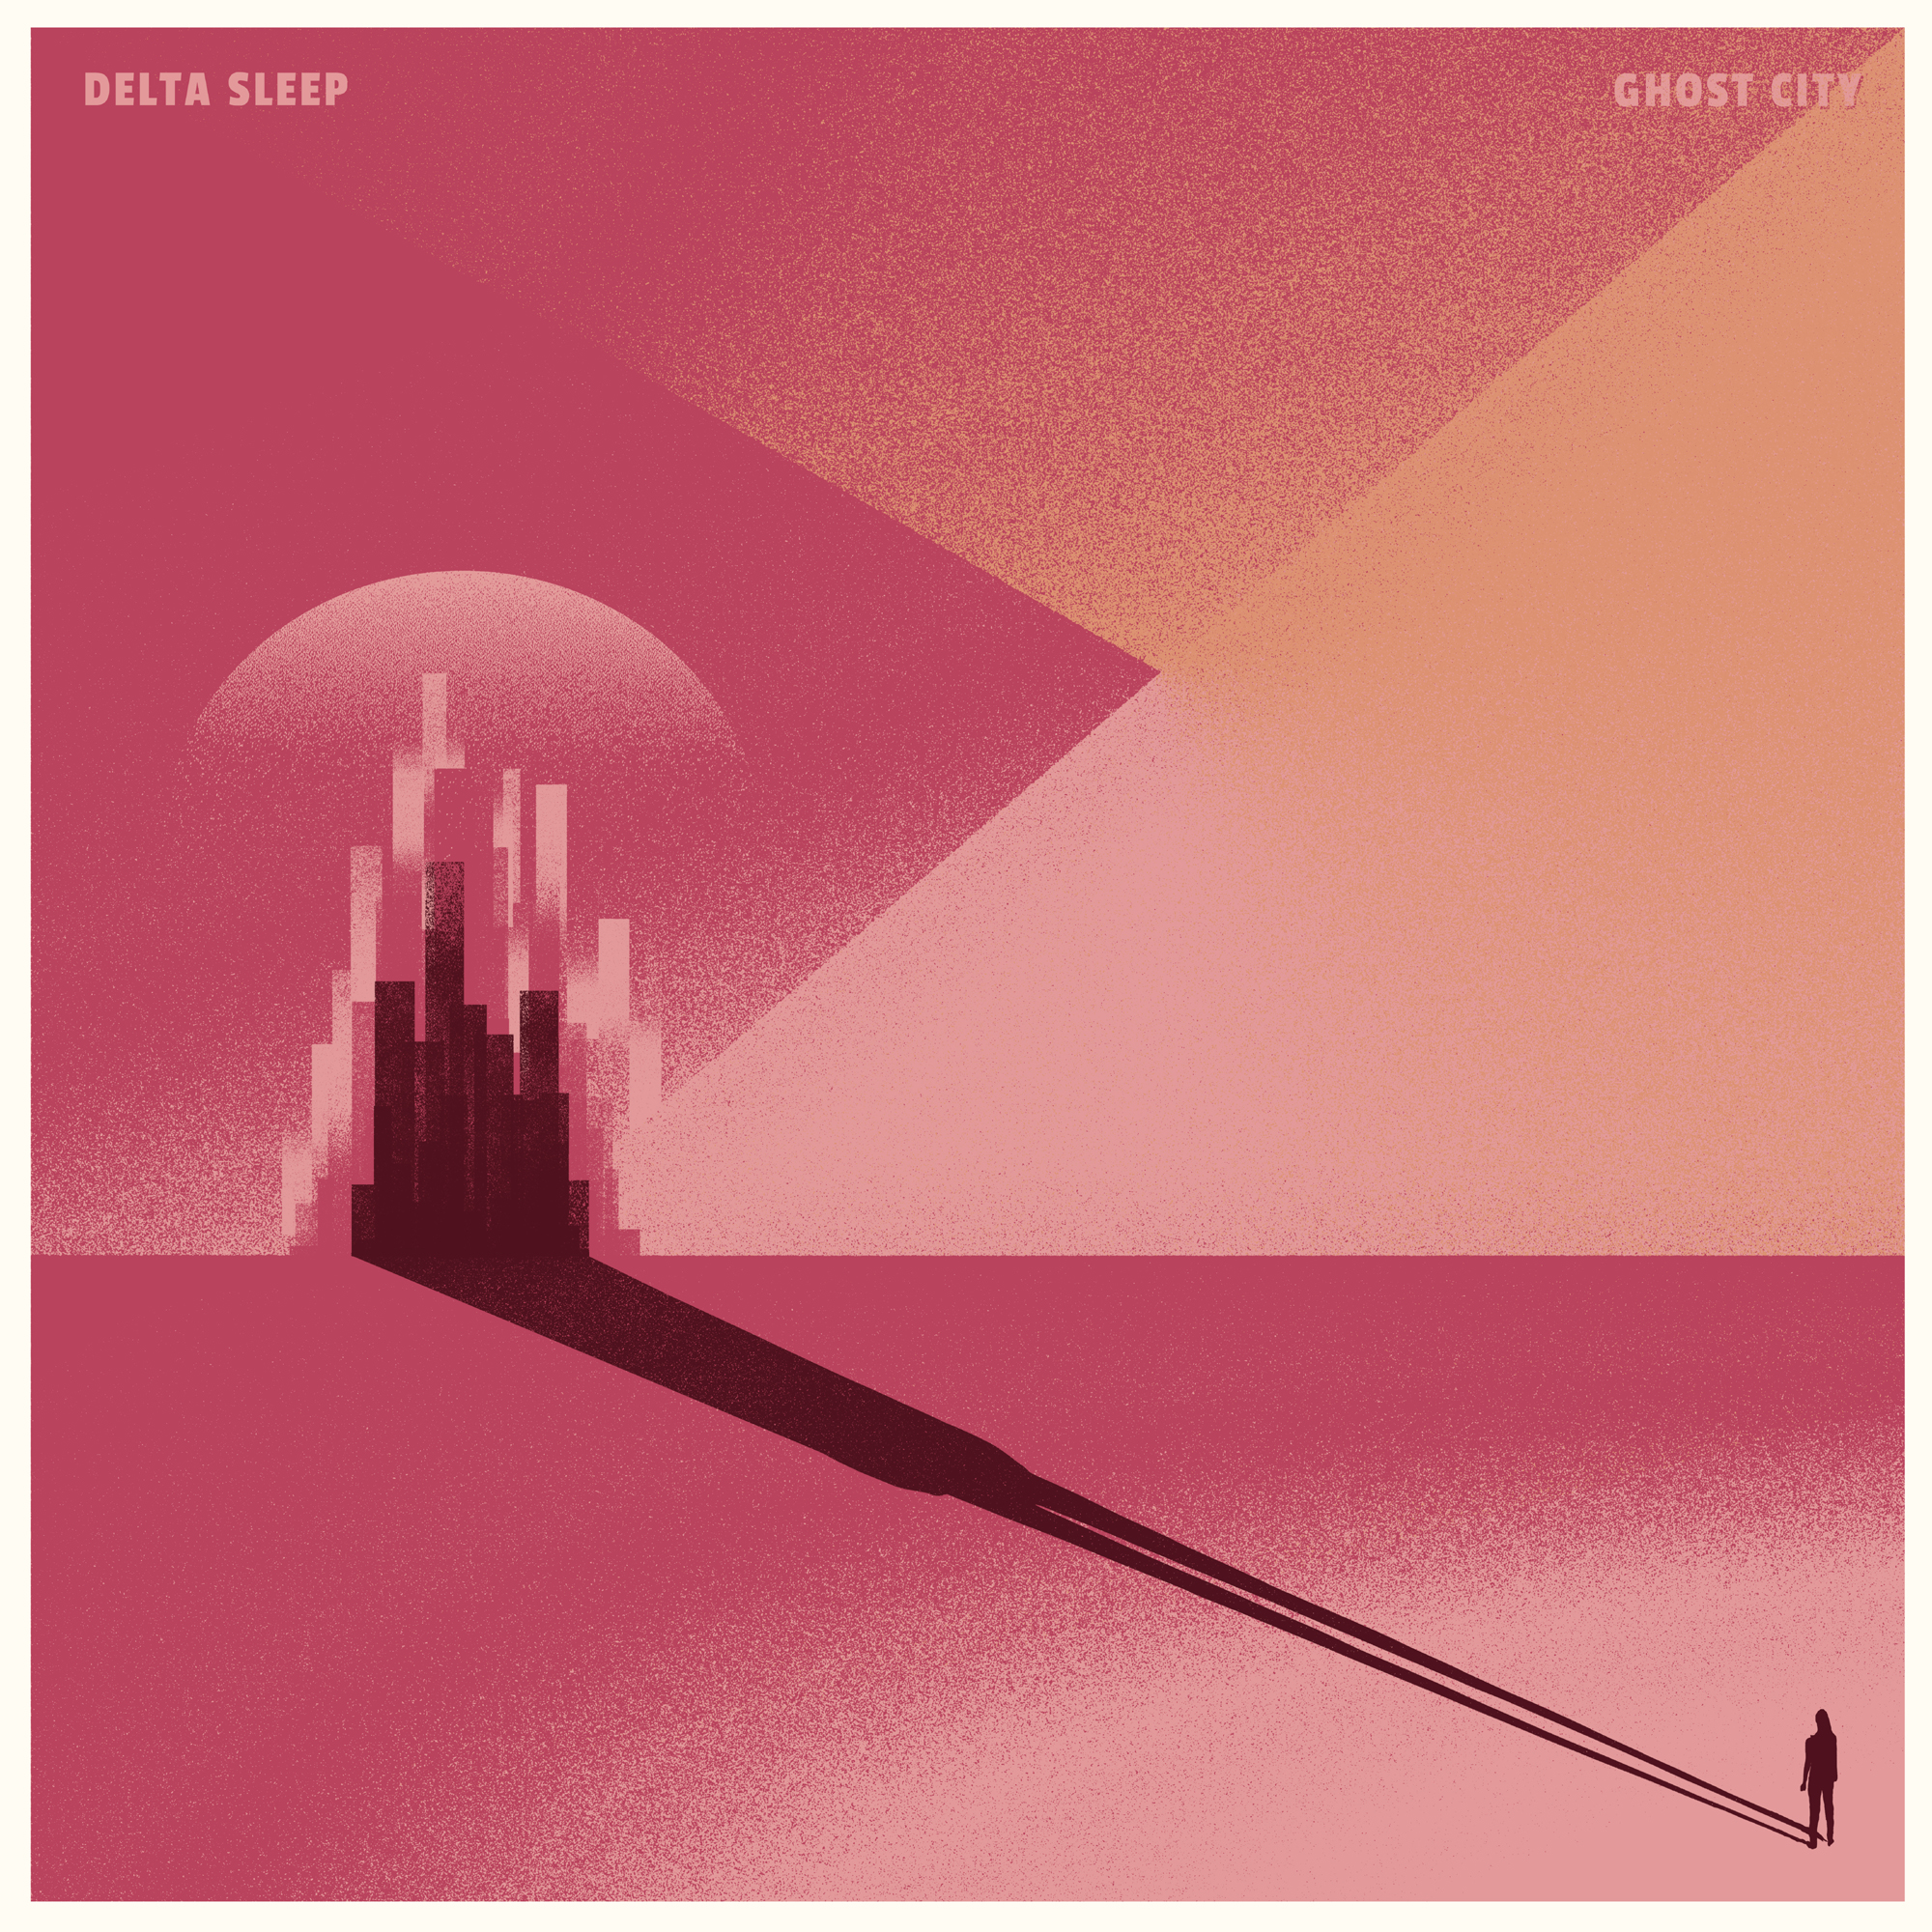 Delta Sleep - Ghost City CD/LP